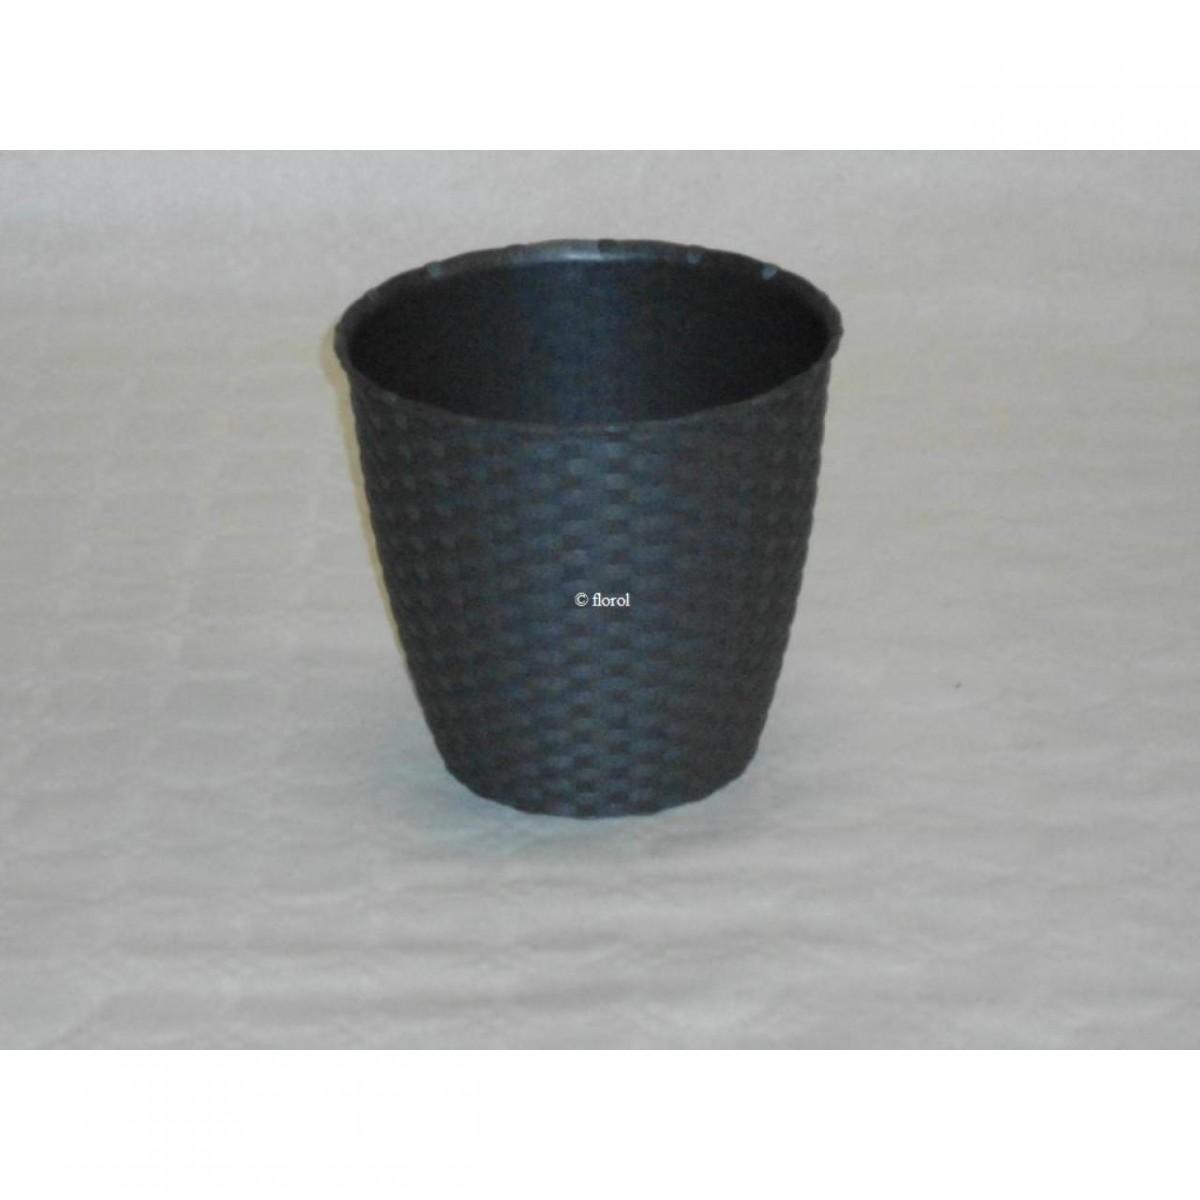 Cache Pied De Sapin Rotin cache-pot plastique tressé imitation rotin anthracite Ø 24